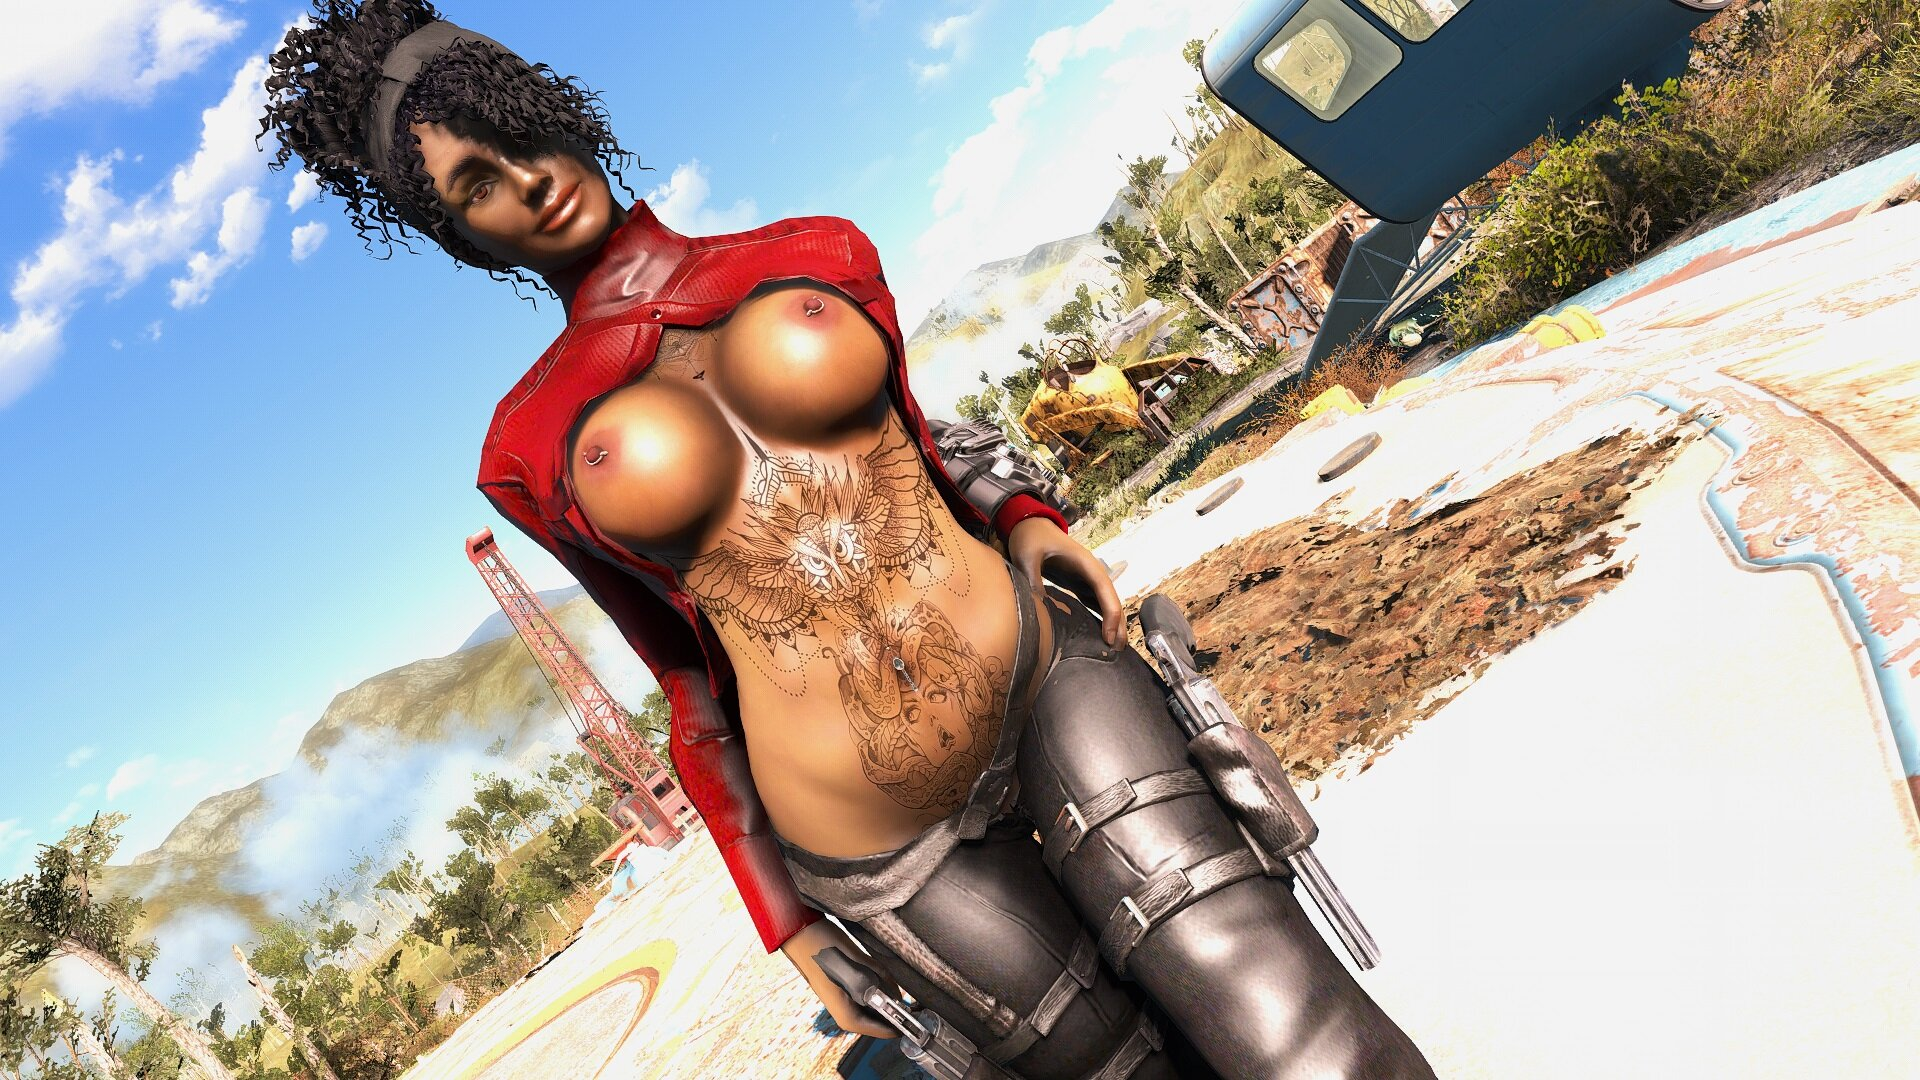 Fallout4 2021-07-23 18-29-55-83.jpg